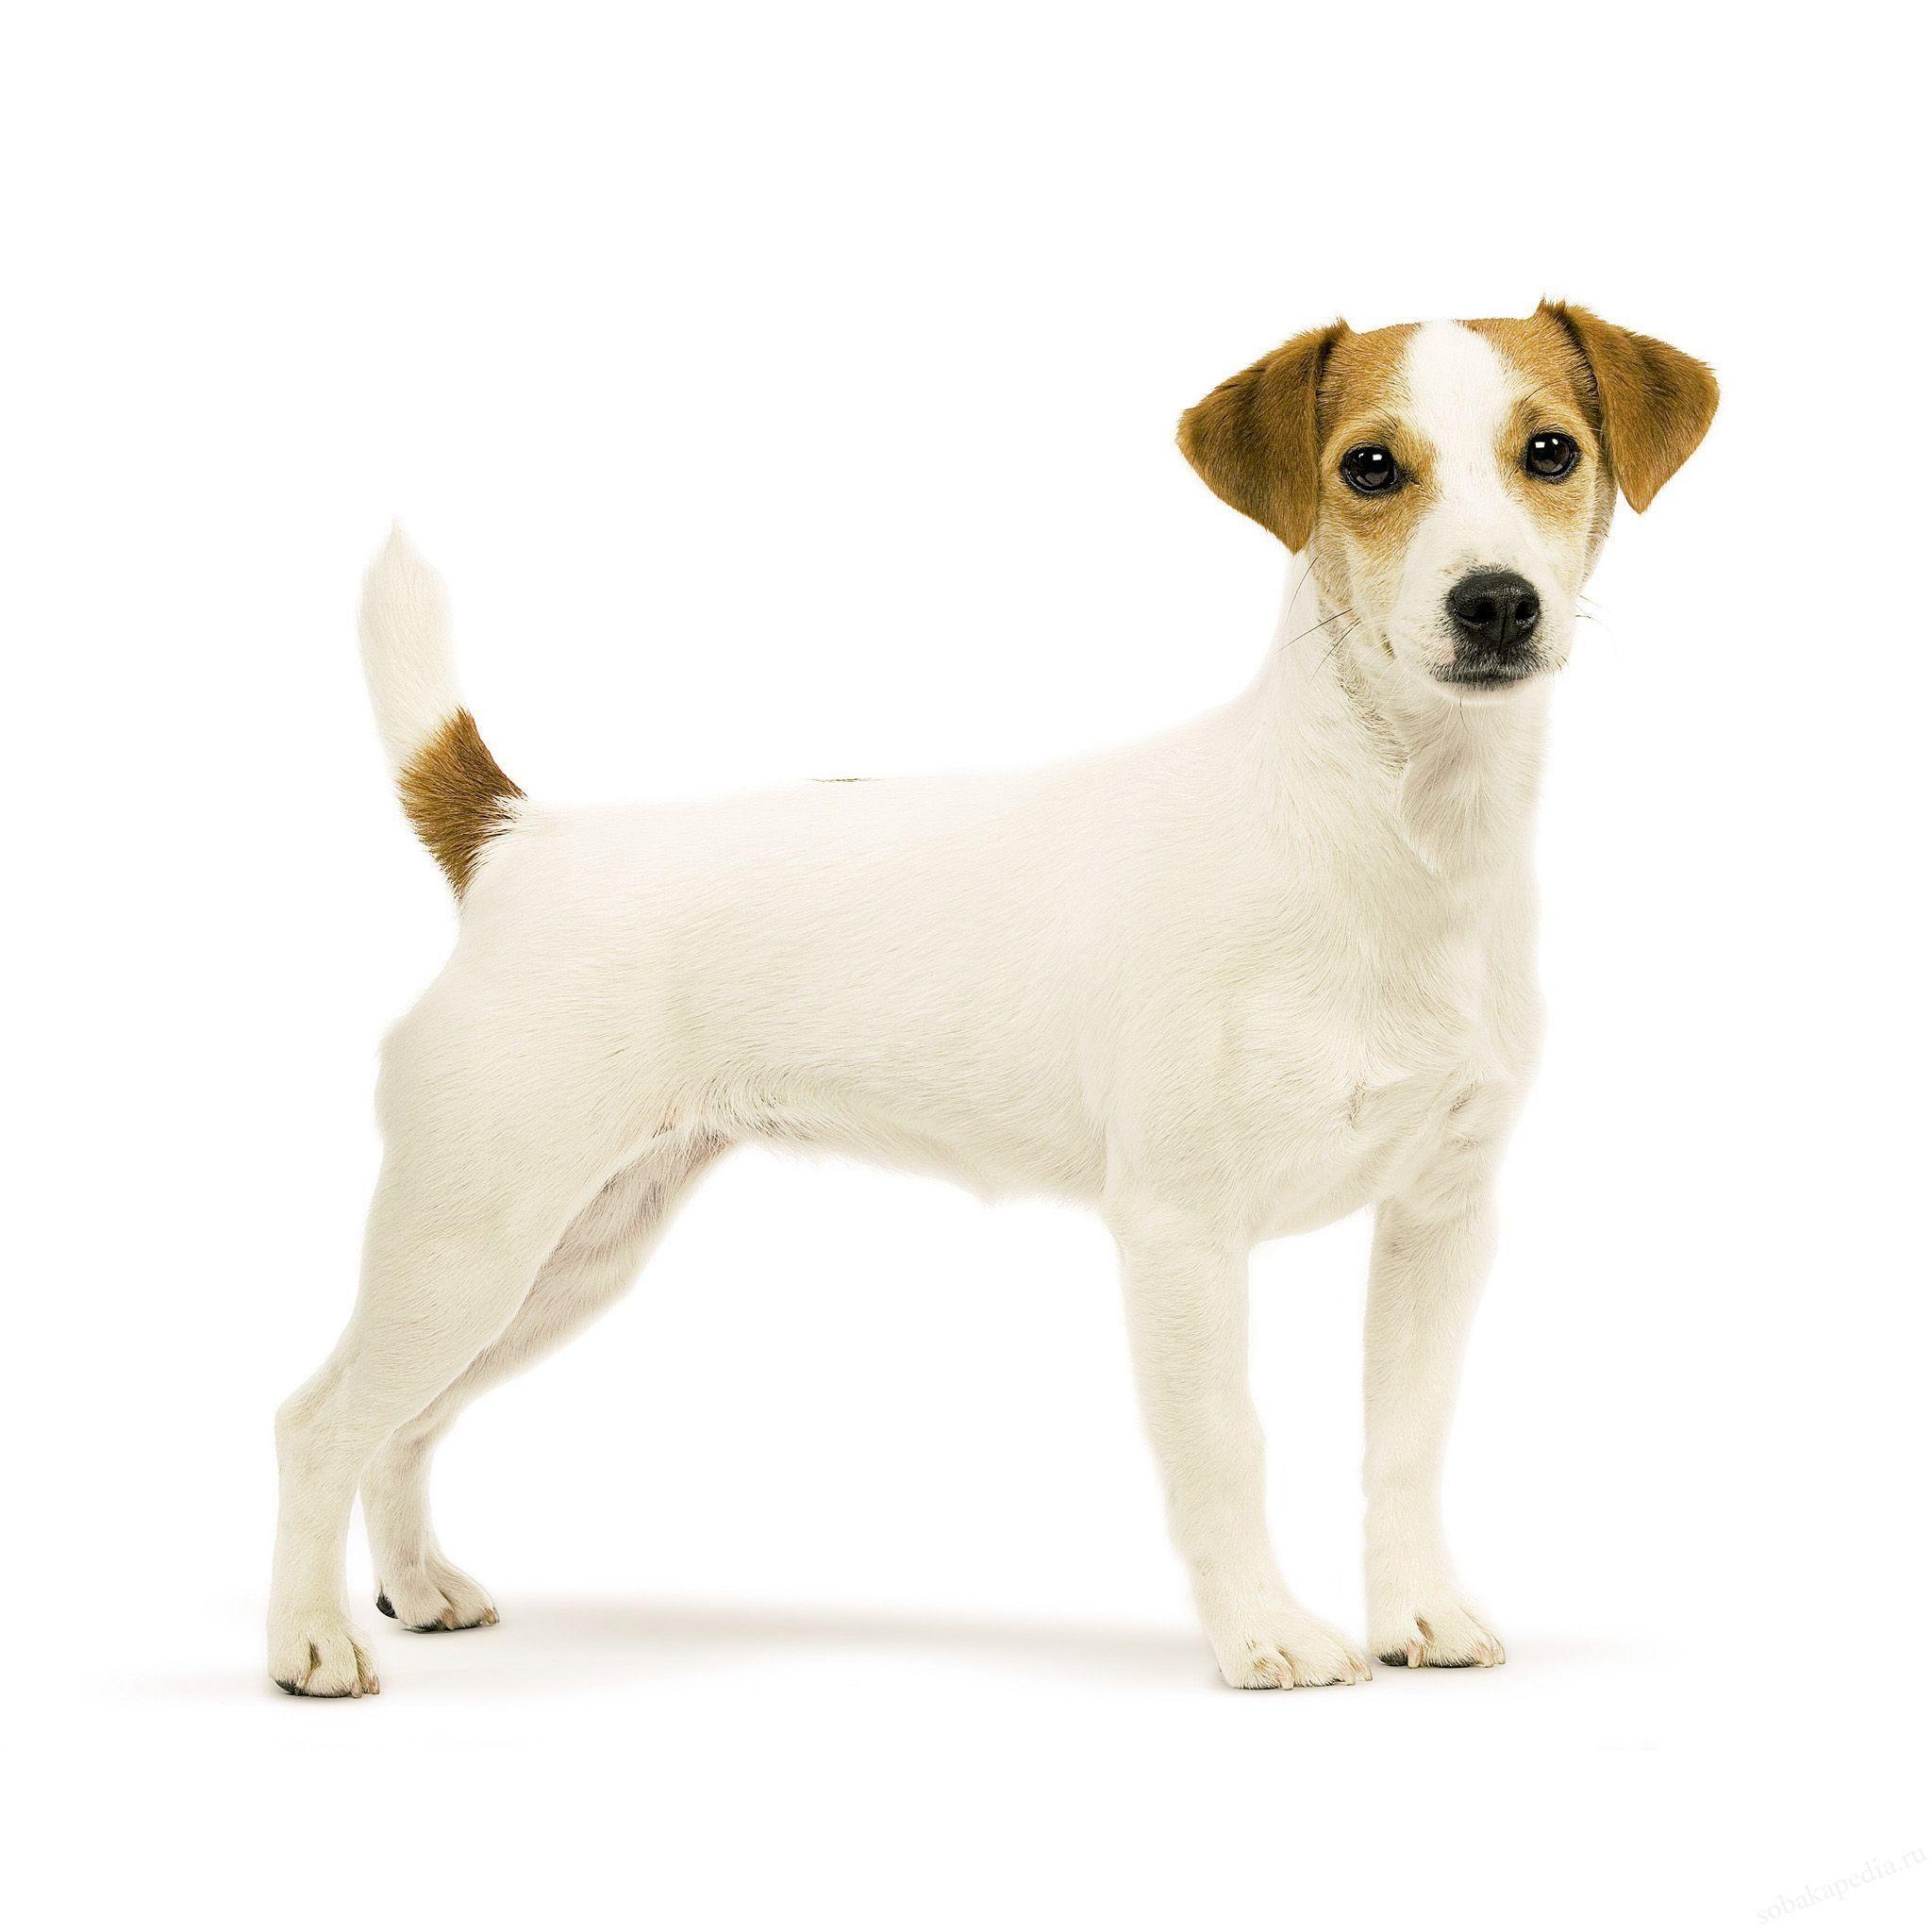 Парсон рассел терьер - описание породы собаки, характер